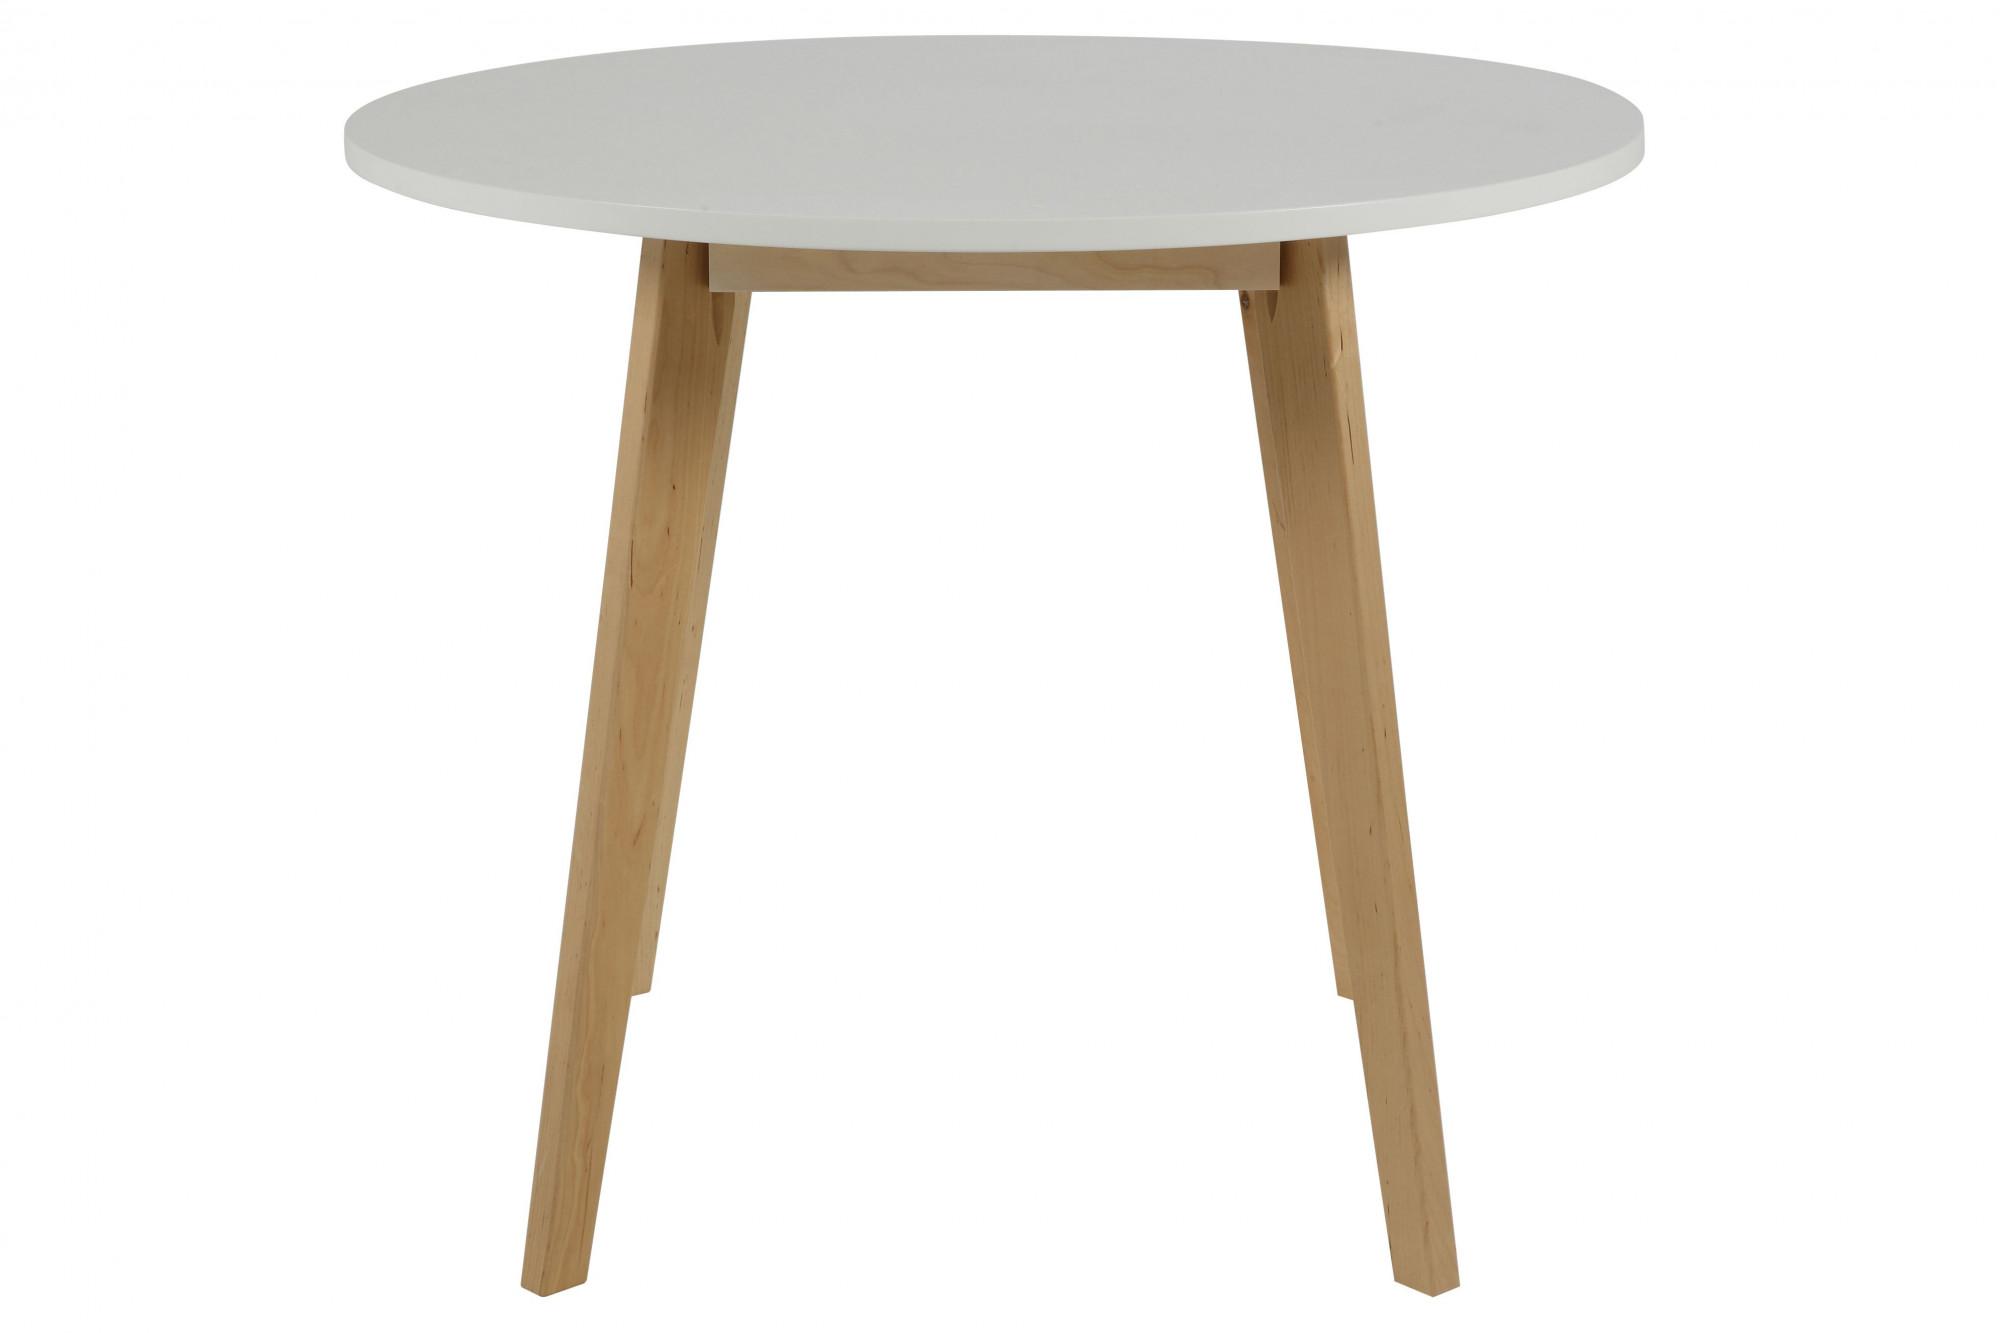 Petite Table Ronde Scandinave En Bois Massif Luza Hellin